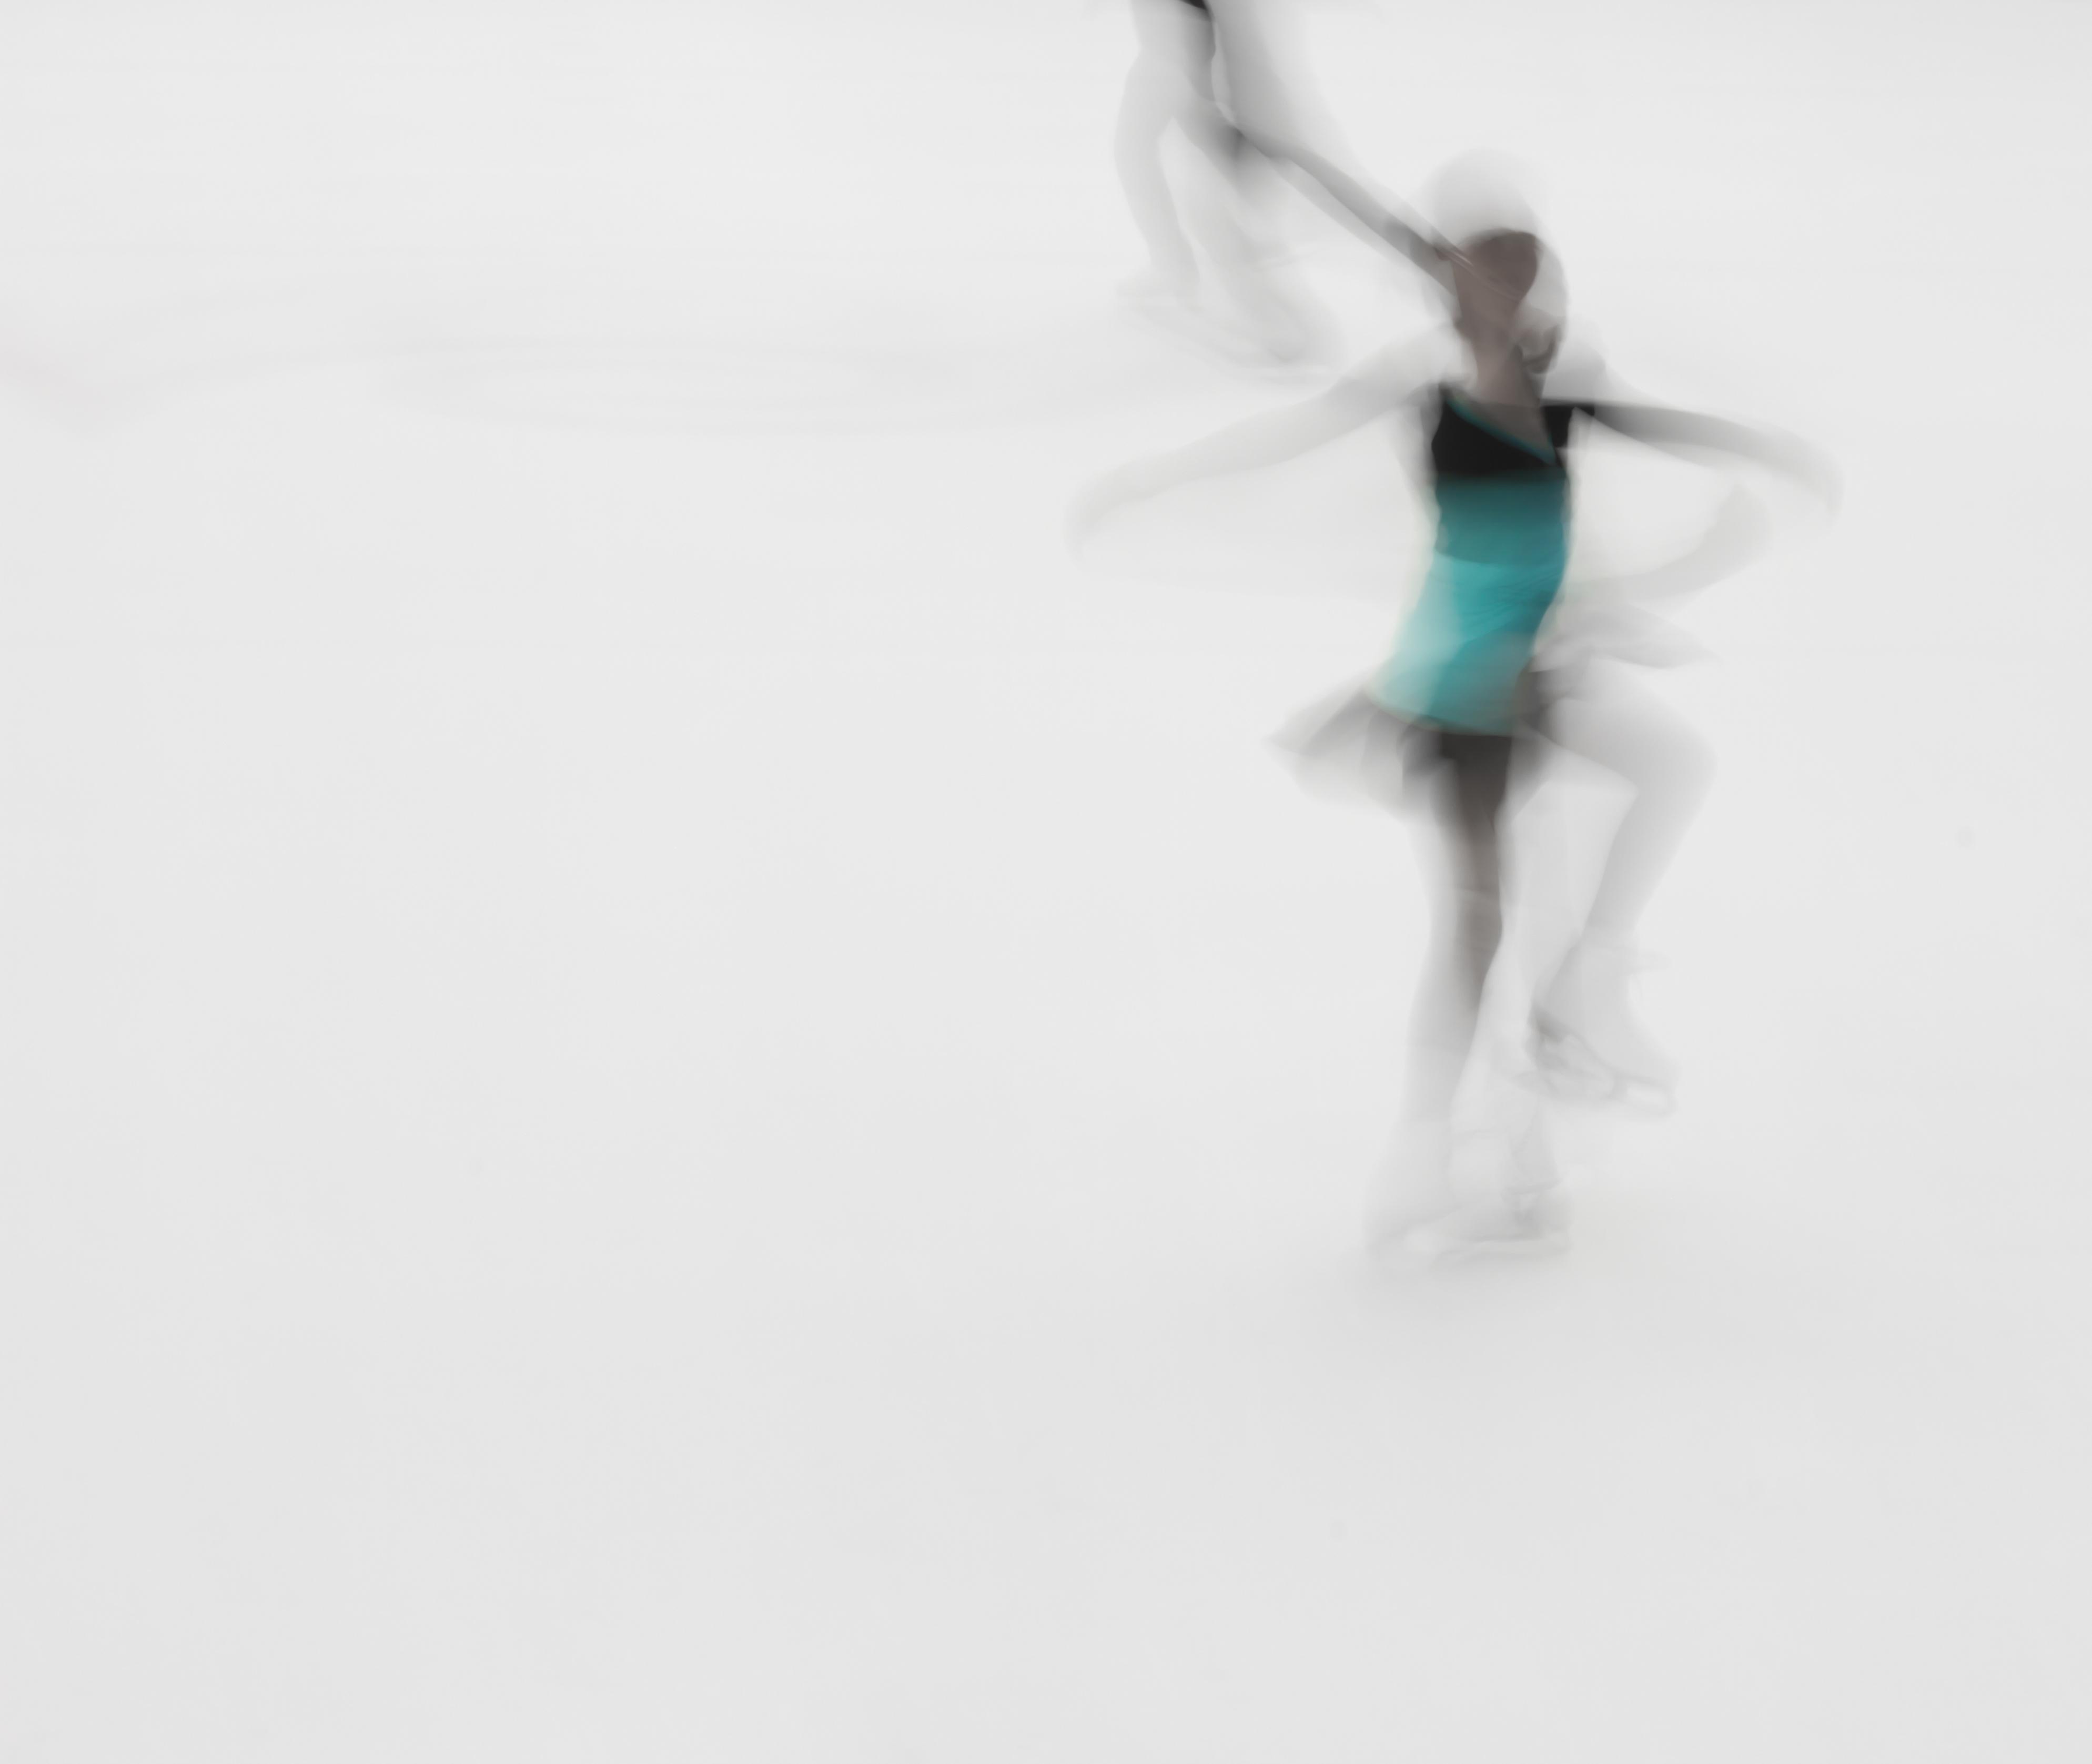 Twirl | Explore Patty Maher's photos on Flickr. Patty ...